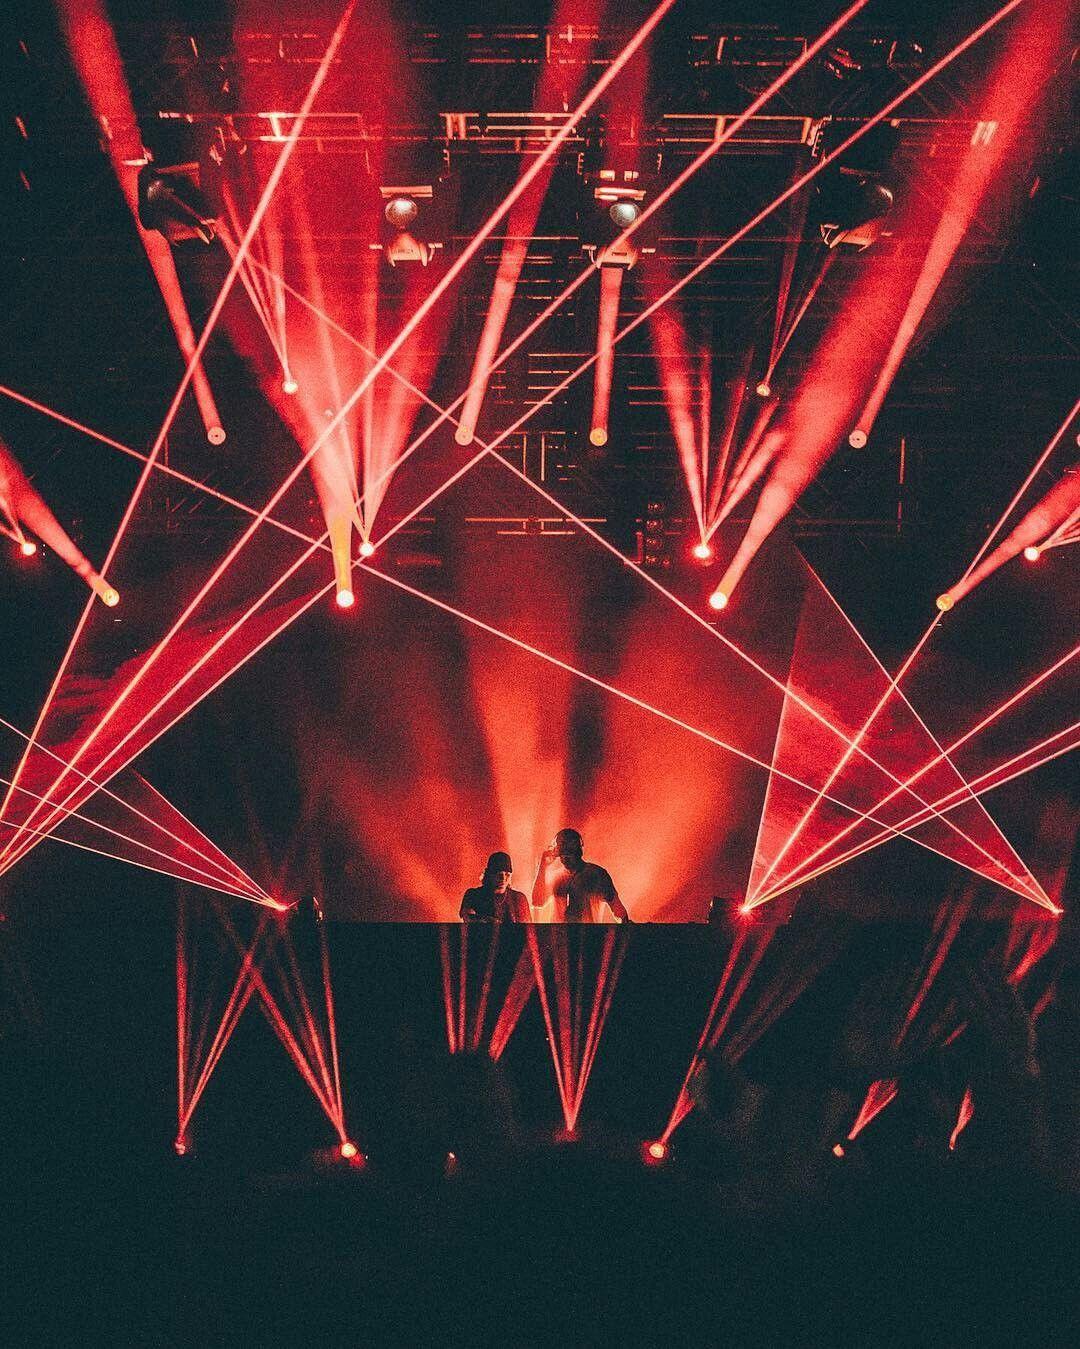 Pin By Julie Negron On Skrillex Skrillex Trance Music Electronic Music Festival